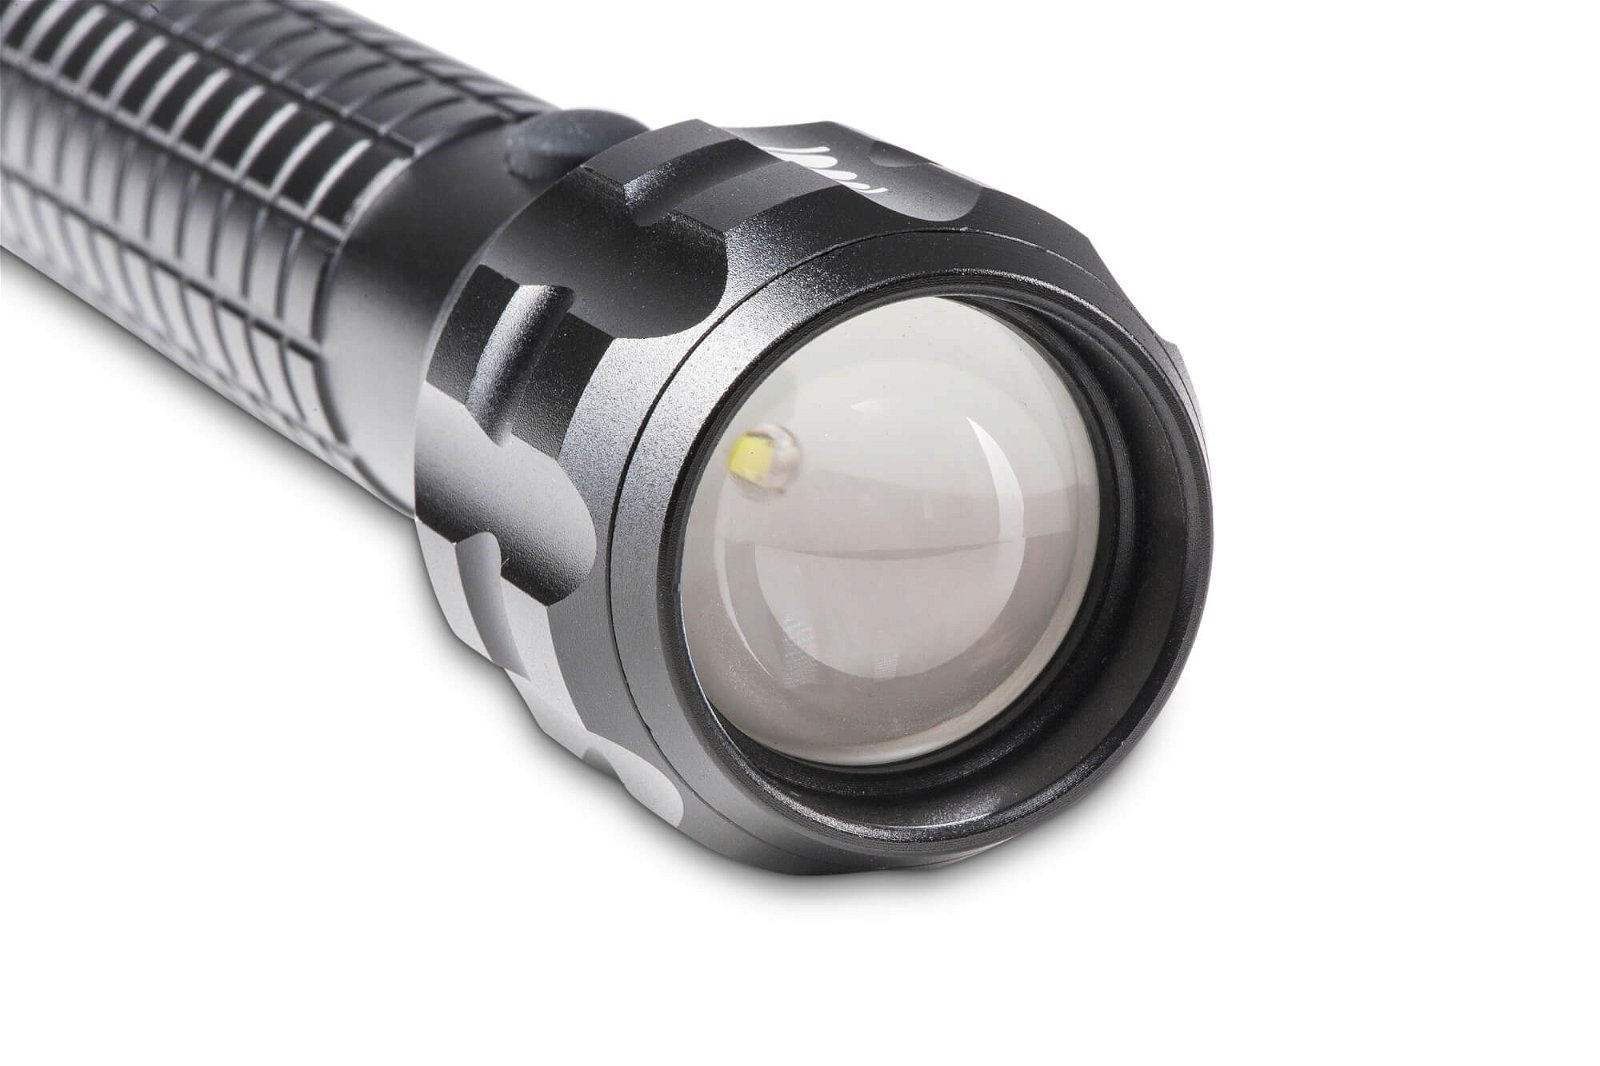 LED-Taschenlampe MAULkronos S